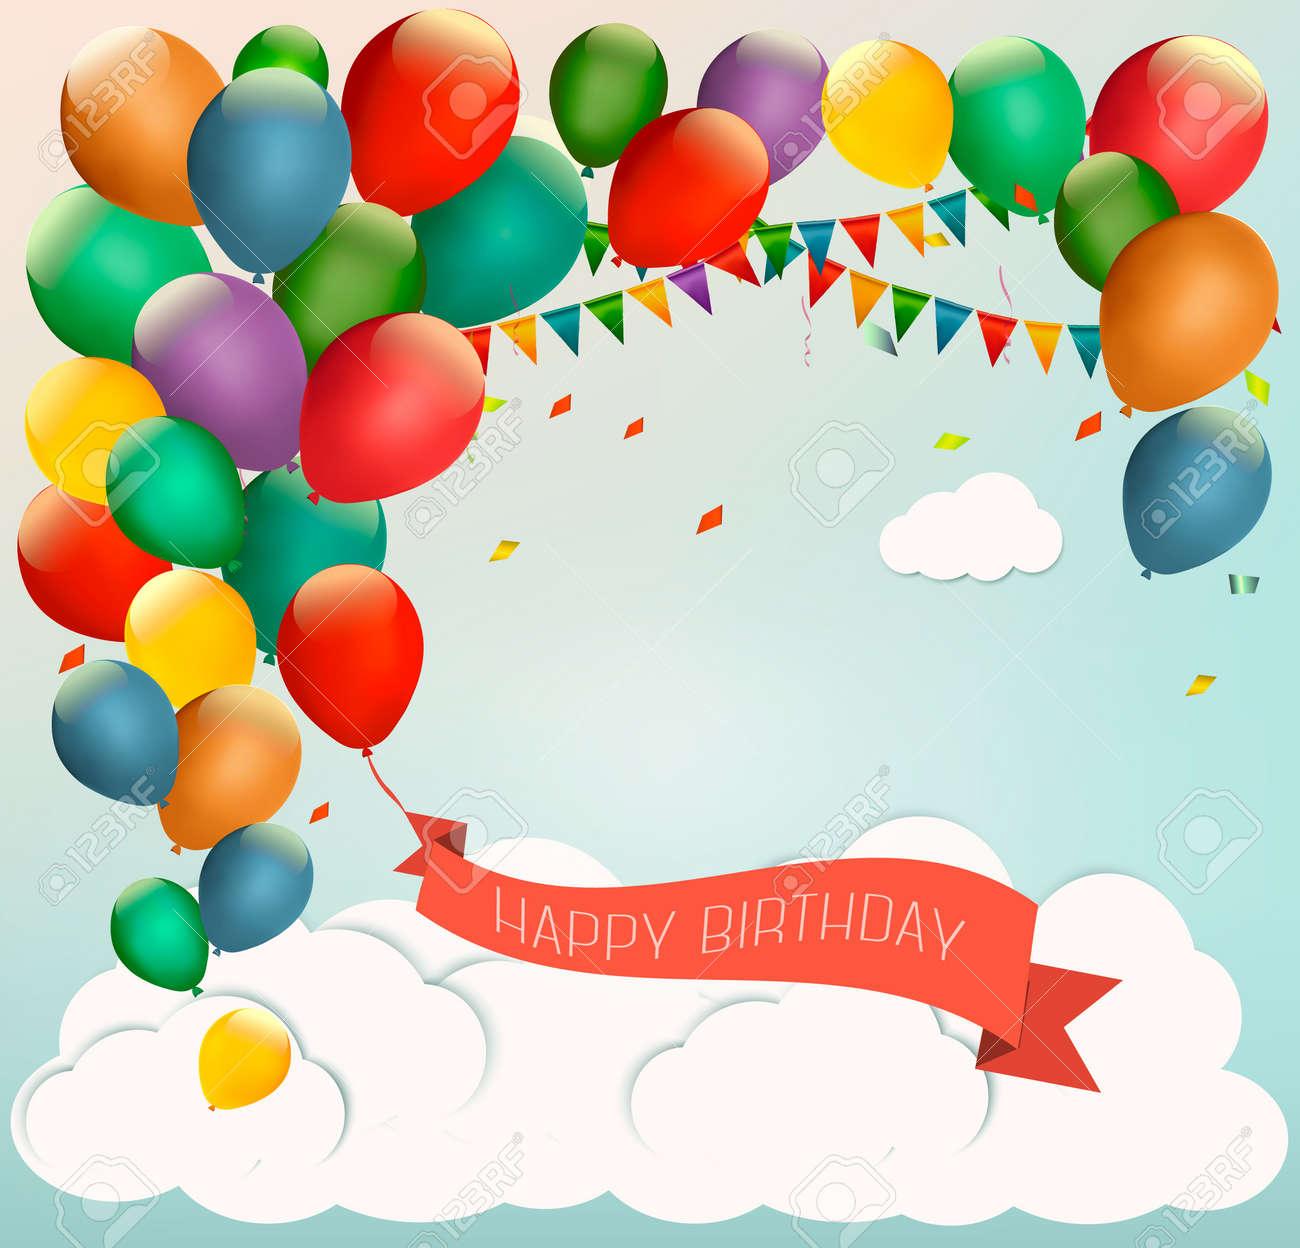 Geburtstag Urlaub Clacypiegloria Blog